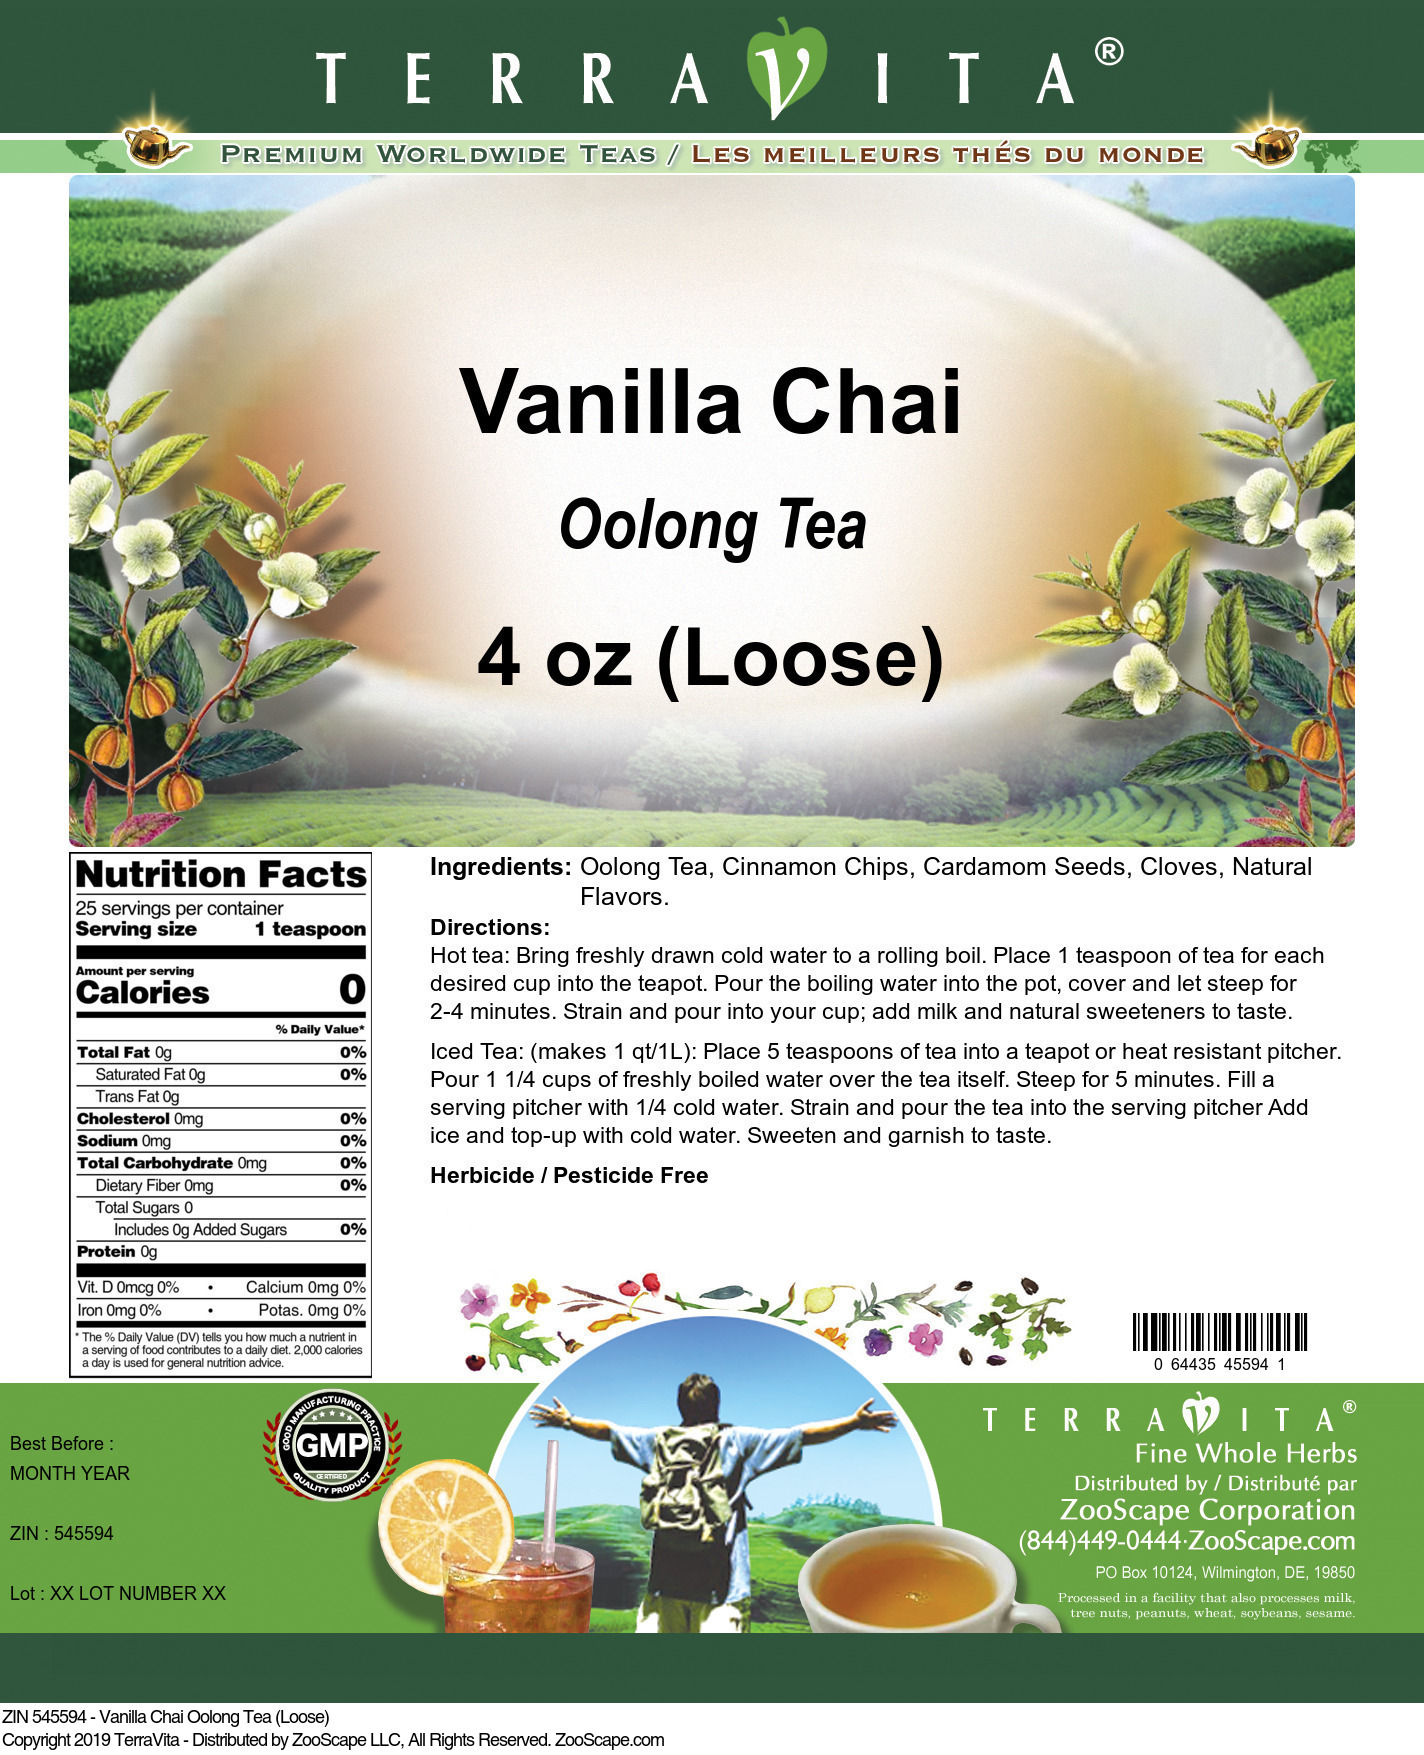 Vanilla Chai Oolong Tea (Loose)